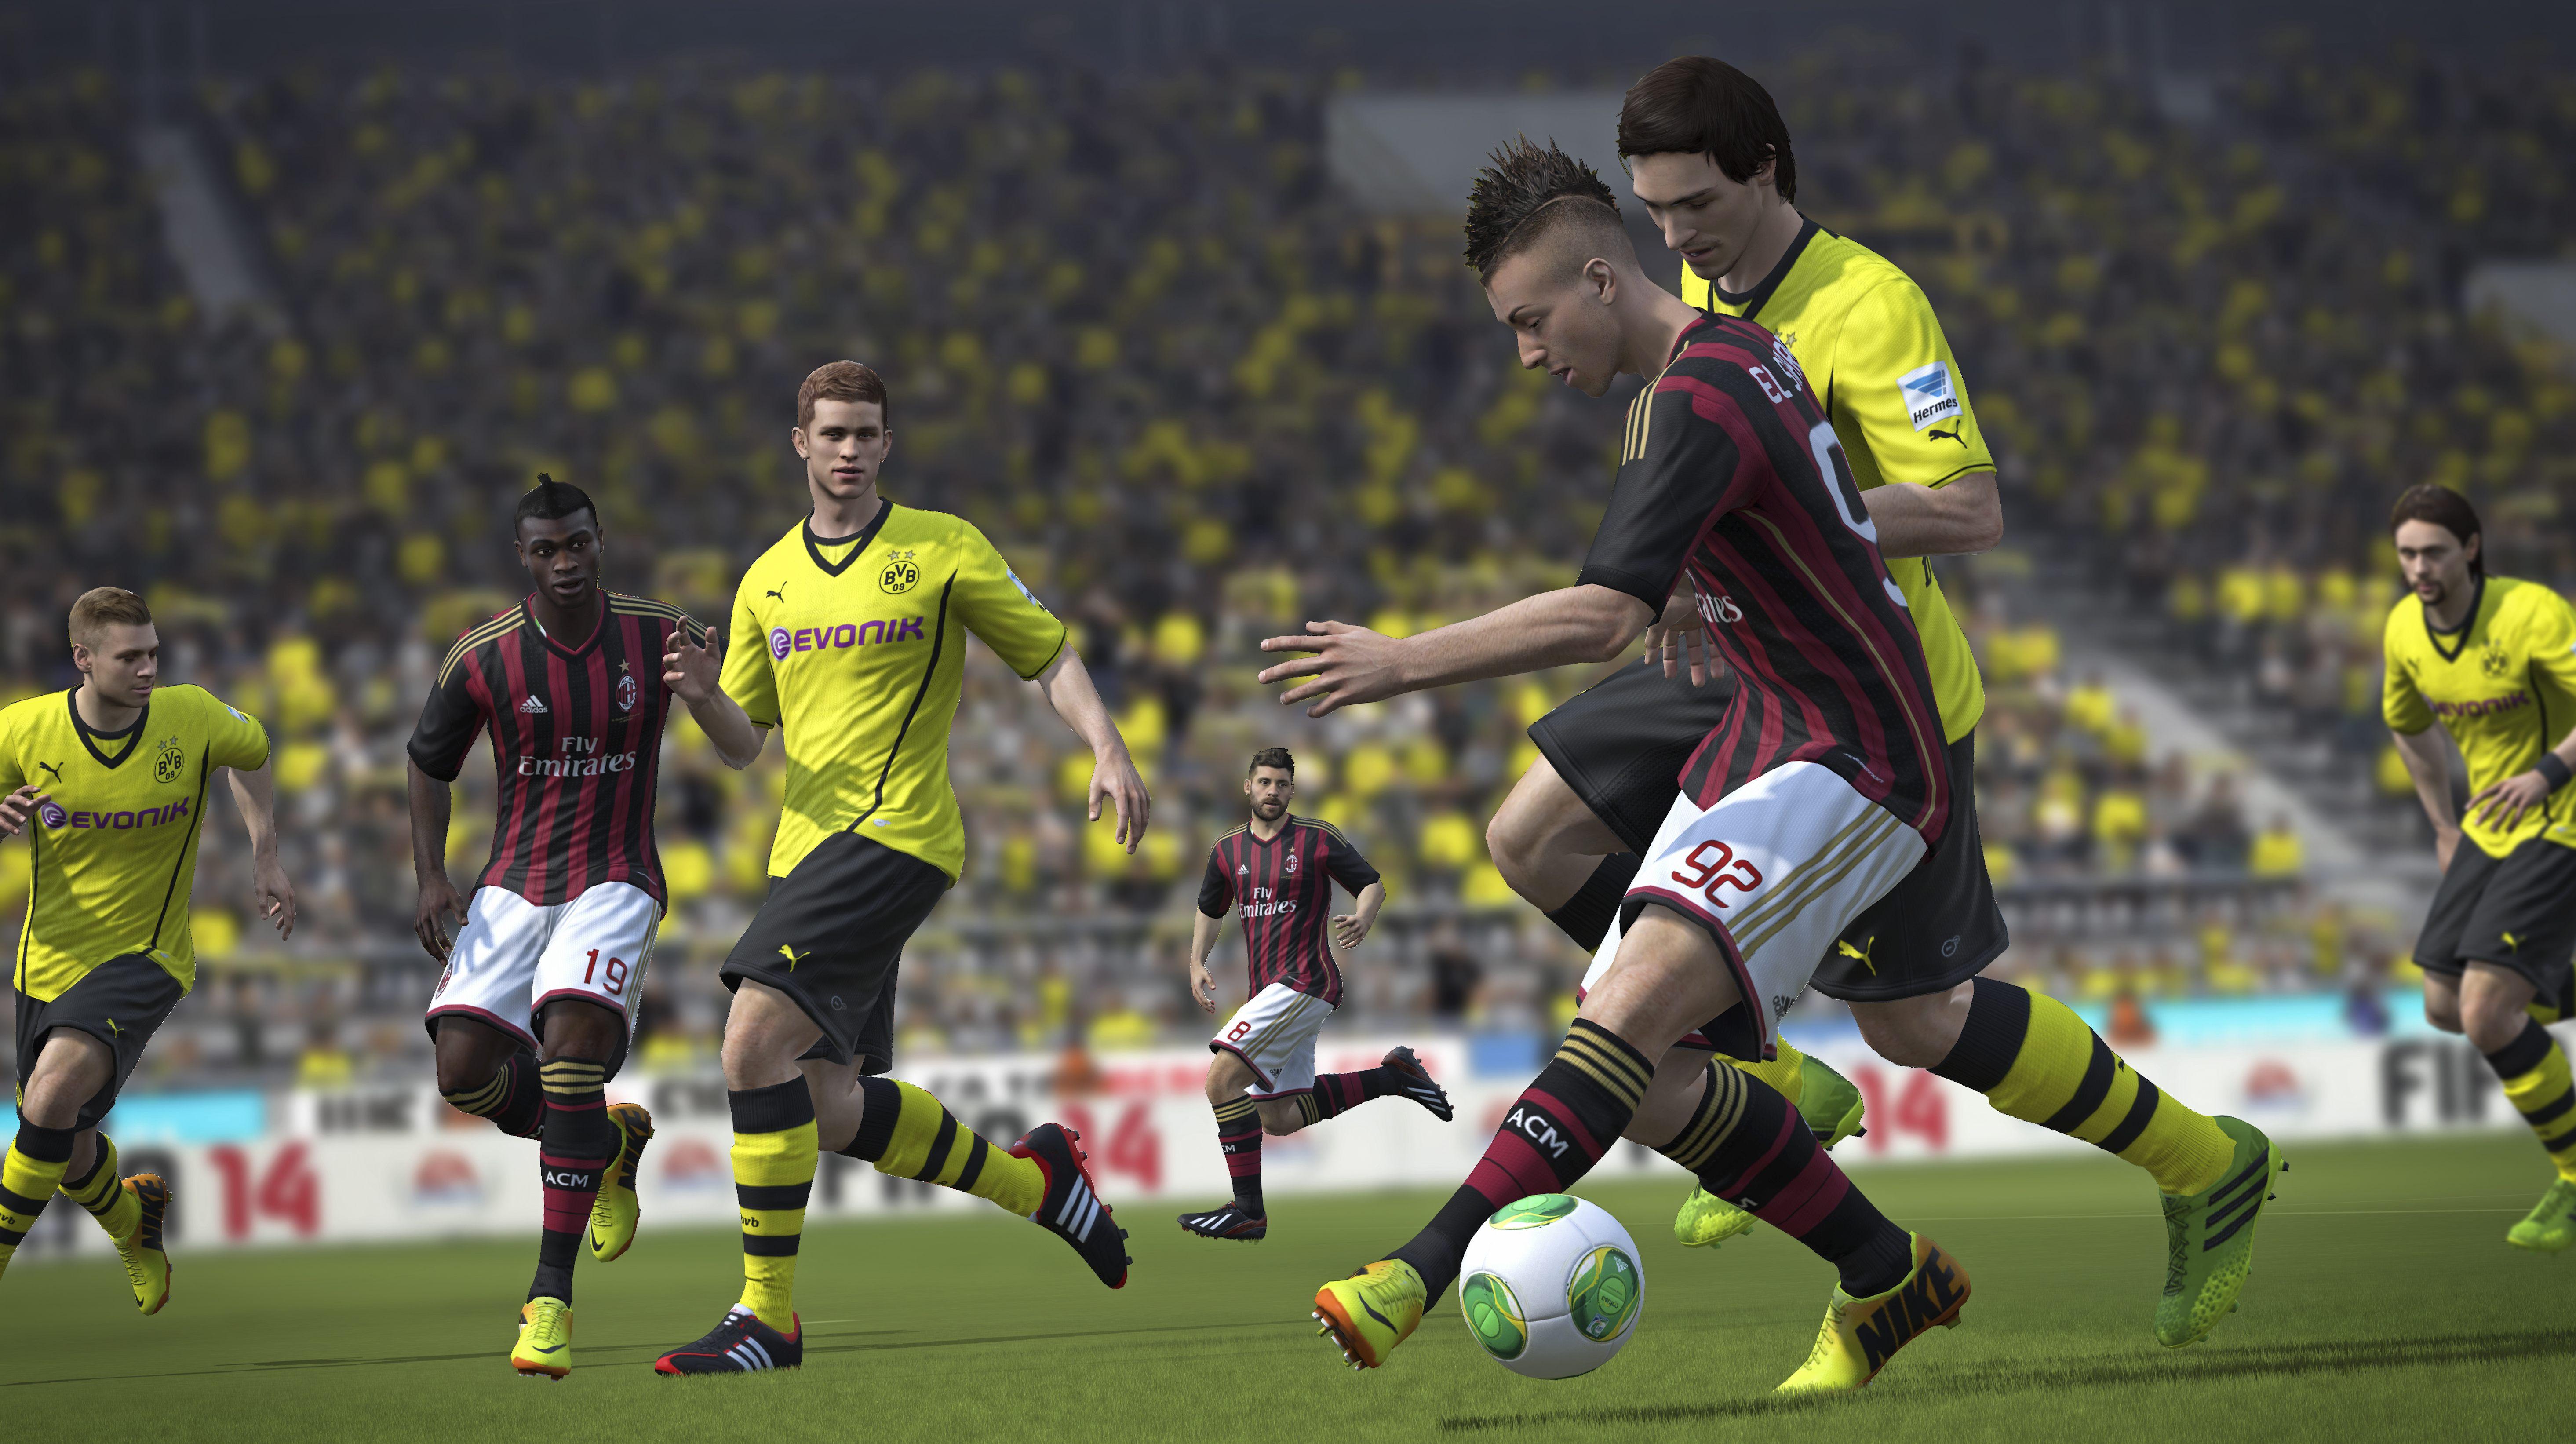 Obrázky z inFamous, NFS: Rivals, FIFA 14, Alien Rage 86407